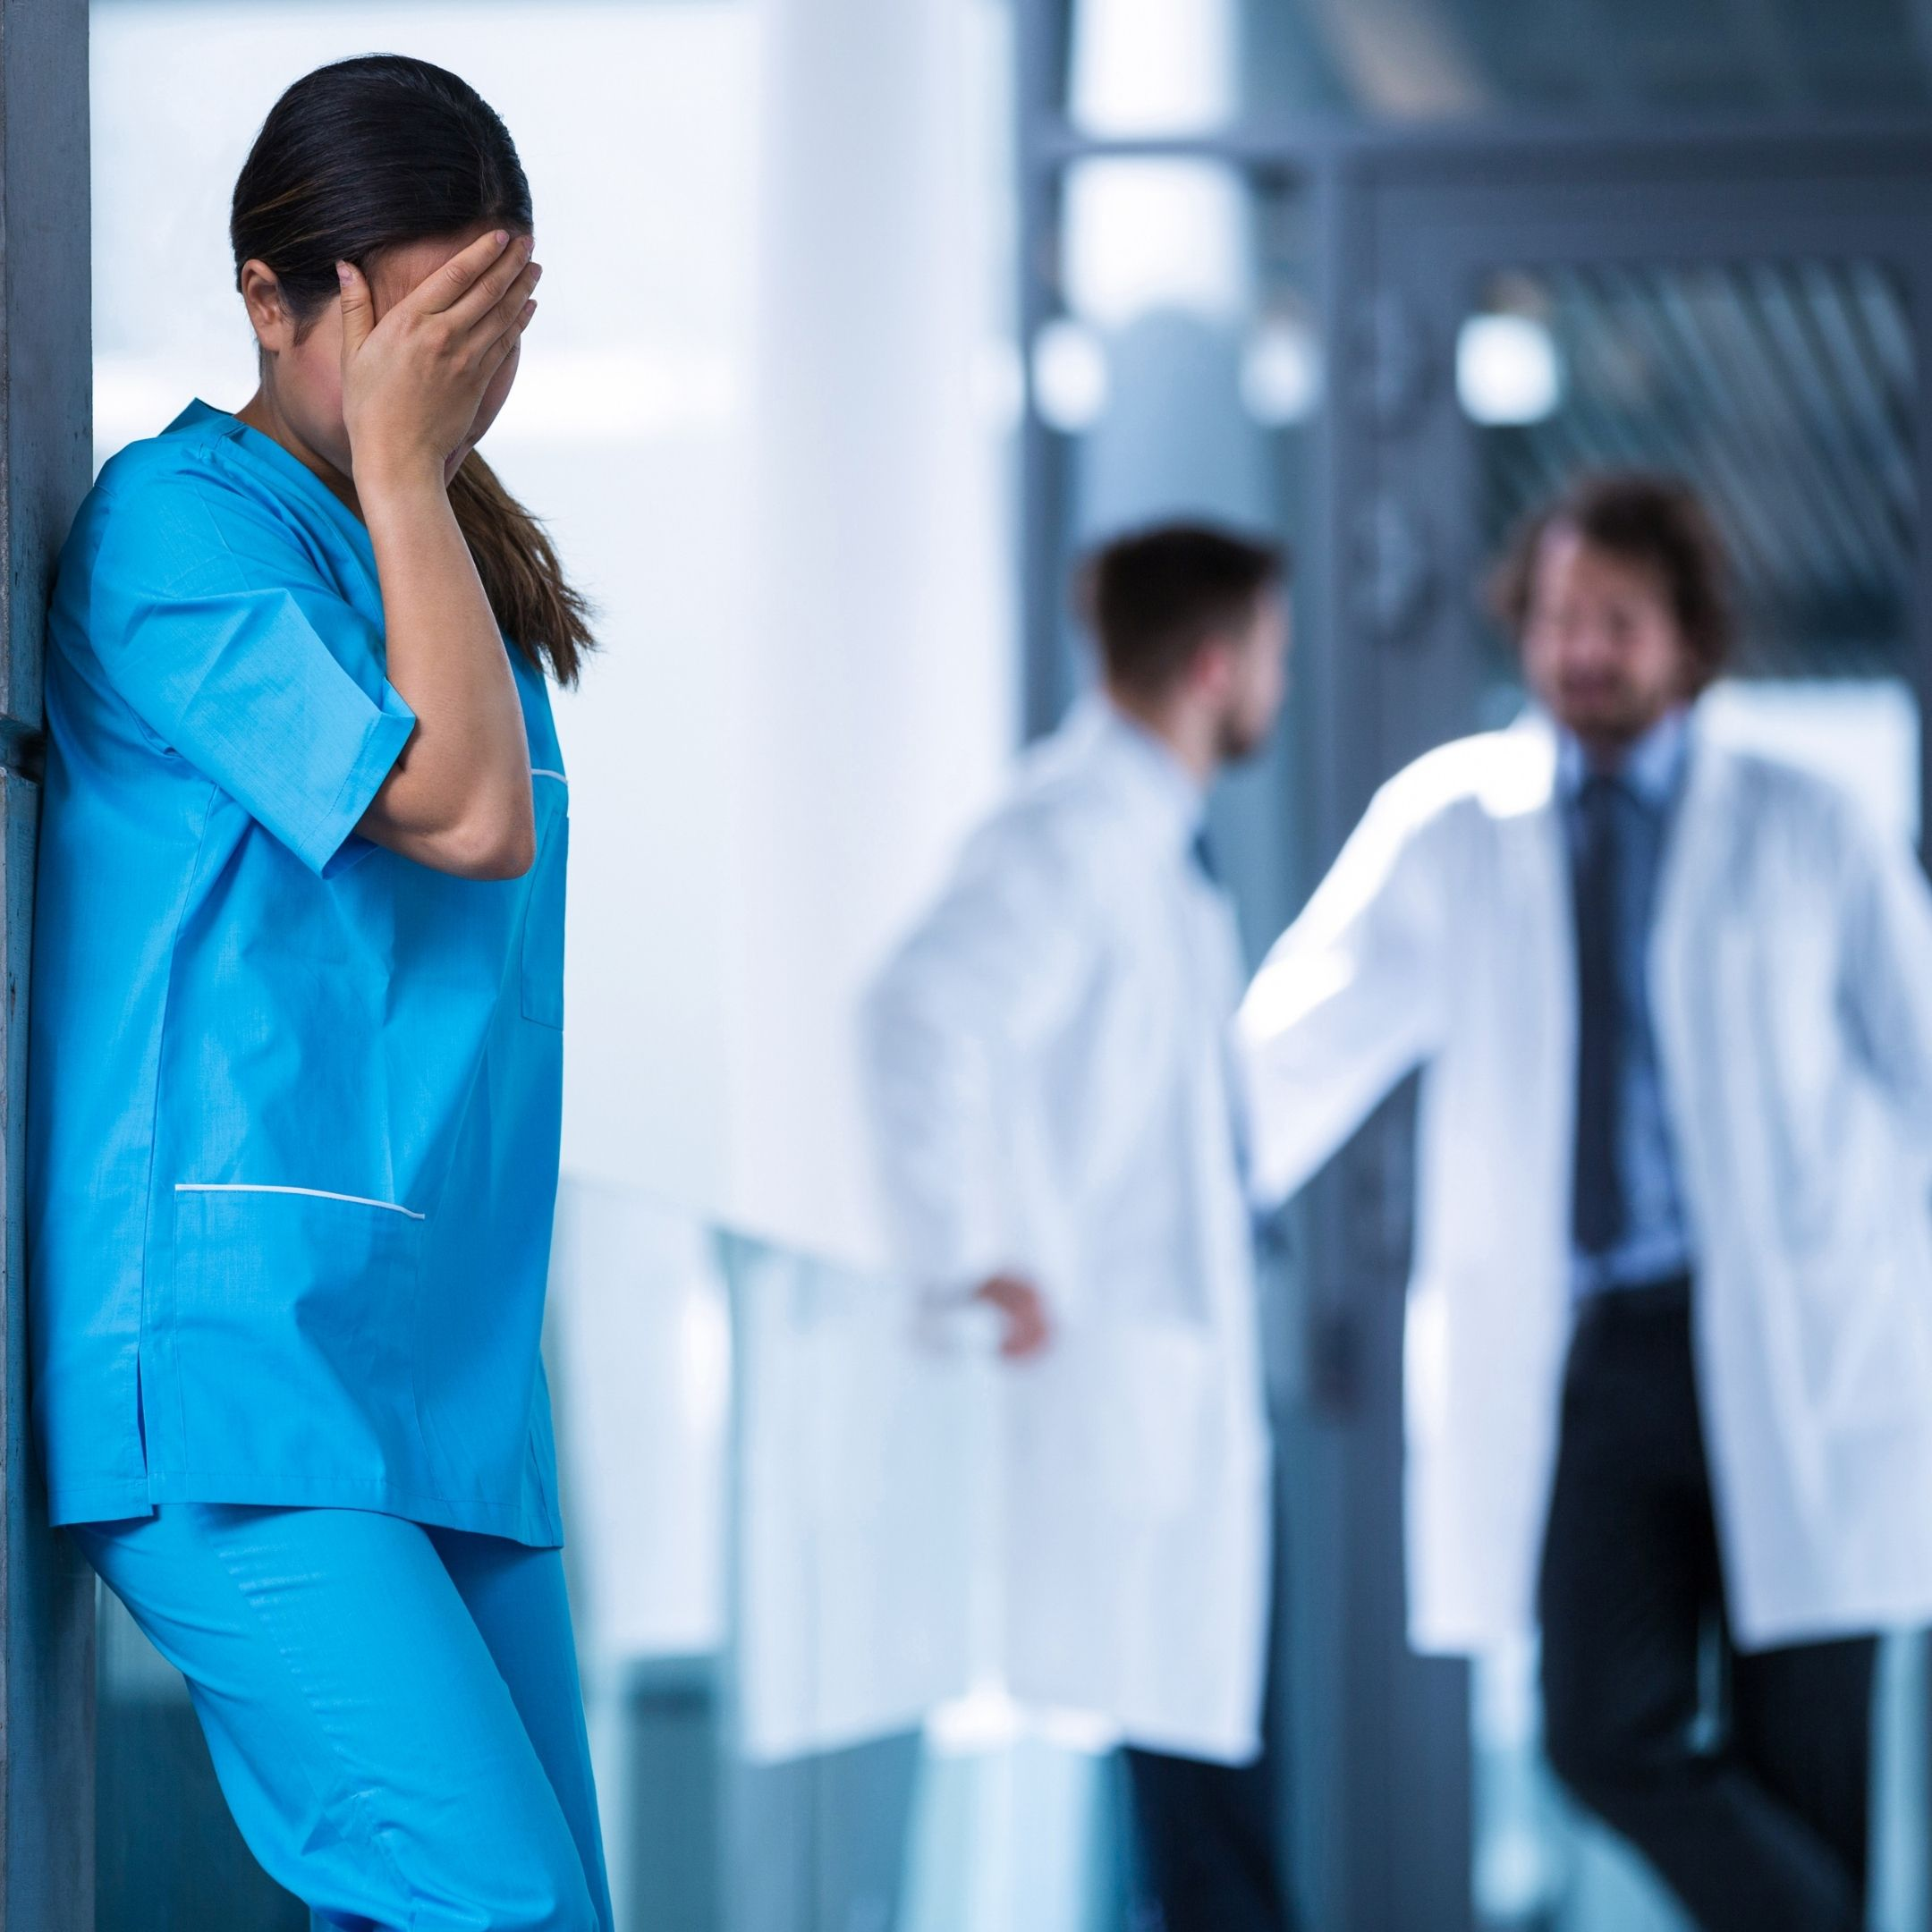 Zuster leidt aan wekdruk werkstess burnout